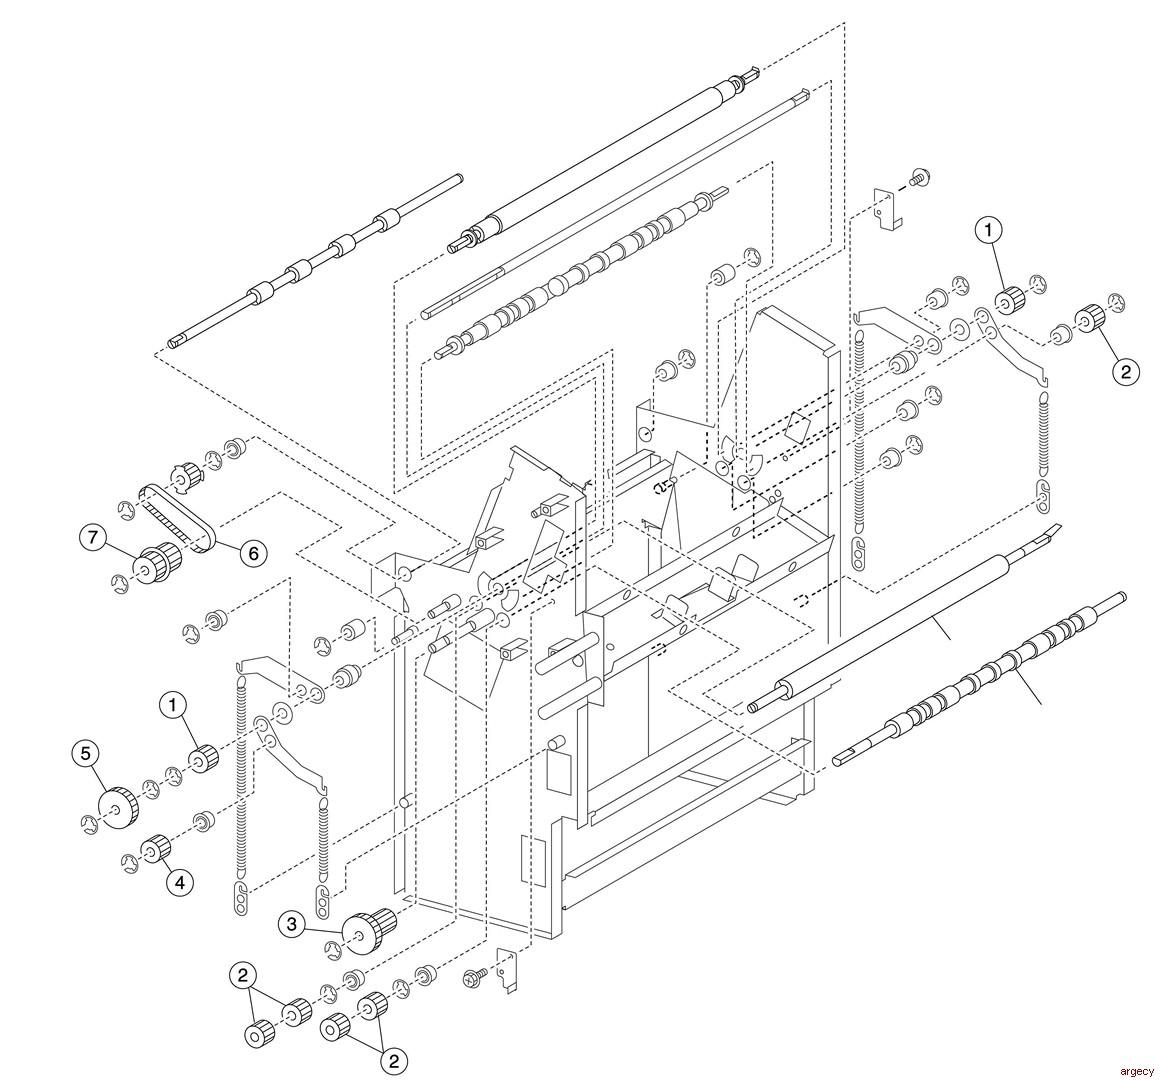 Lexmark X860de, X862de, & X864de Booklet Maker Finisher